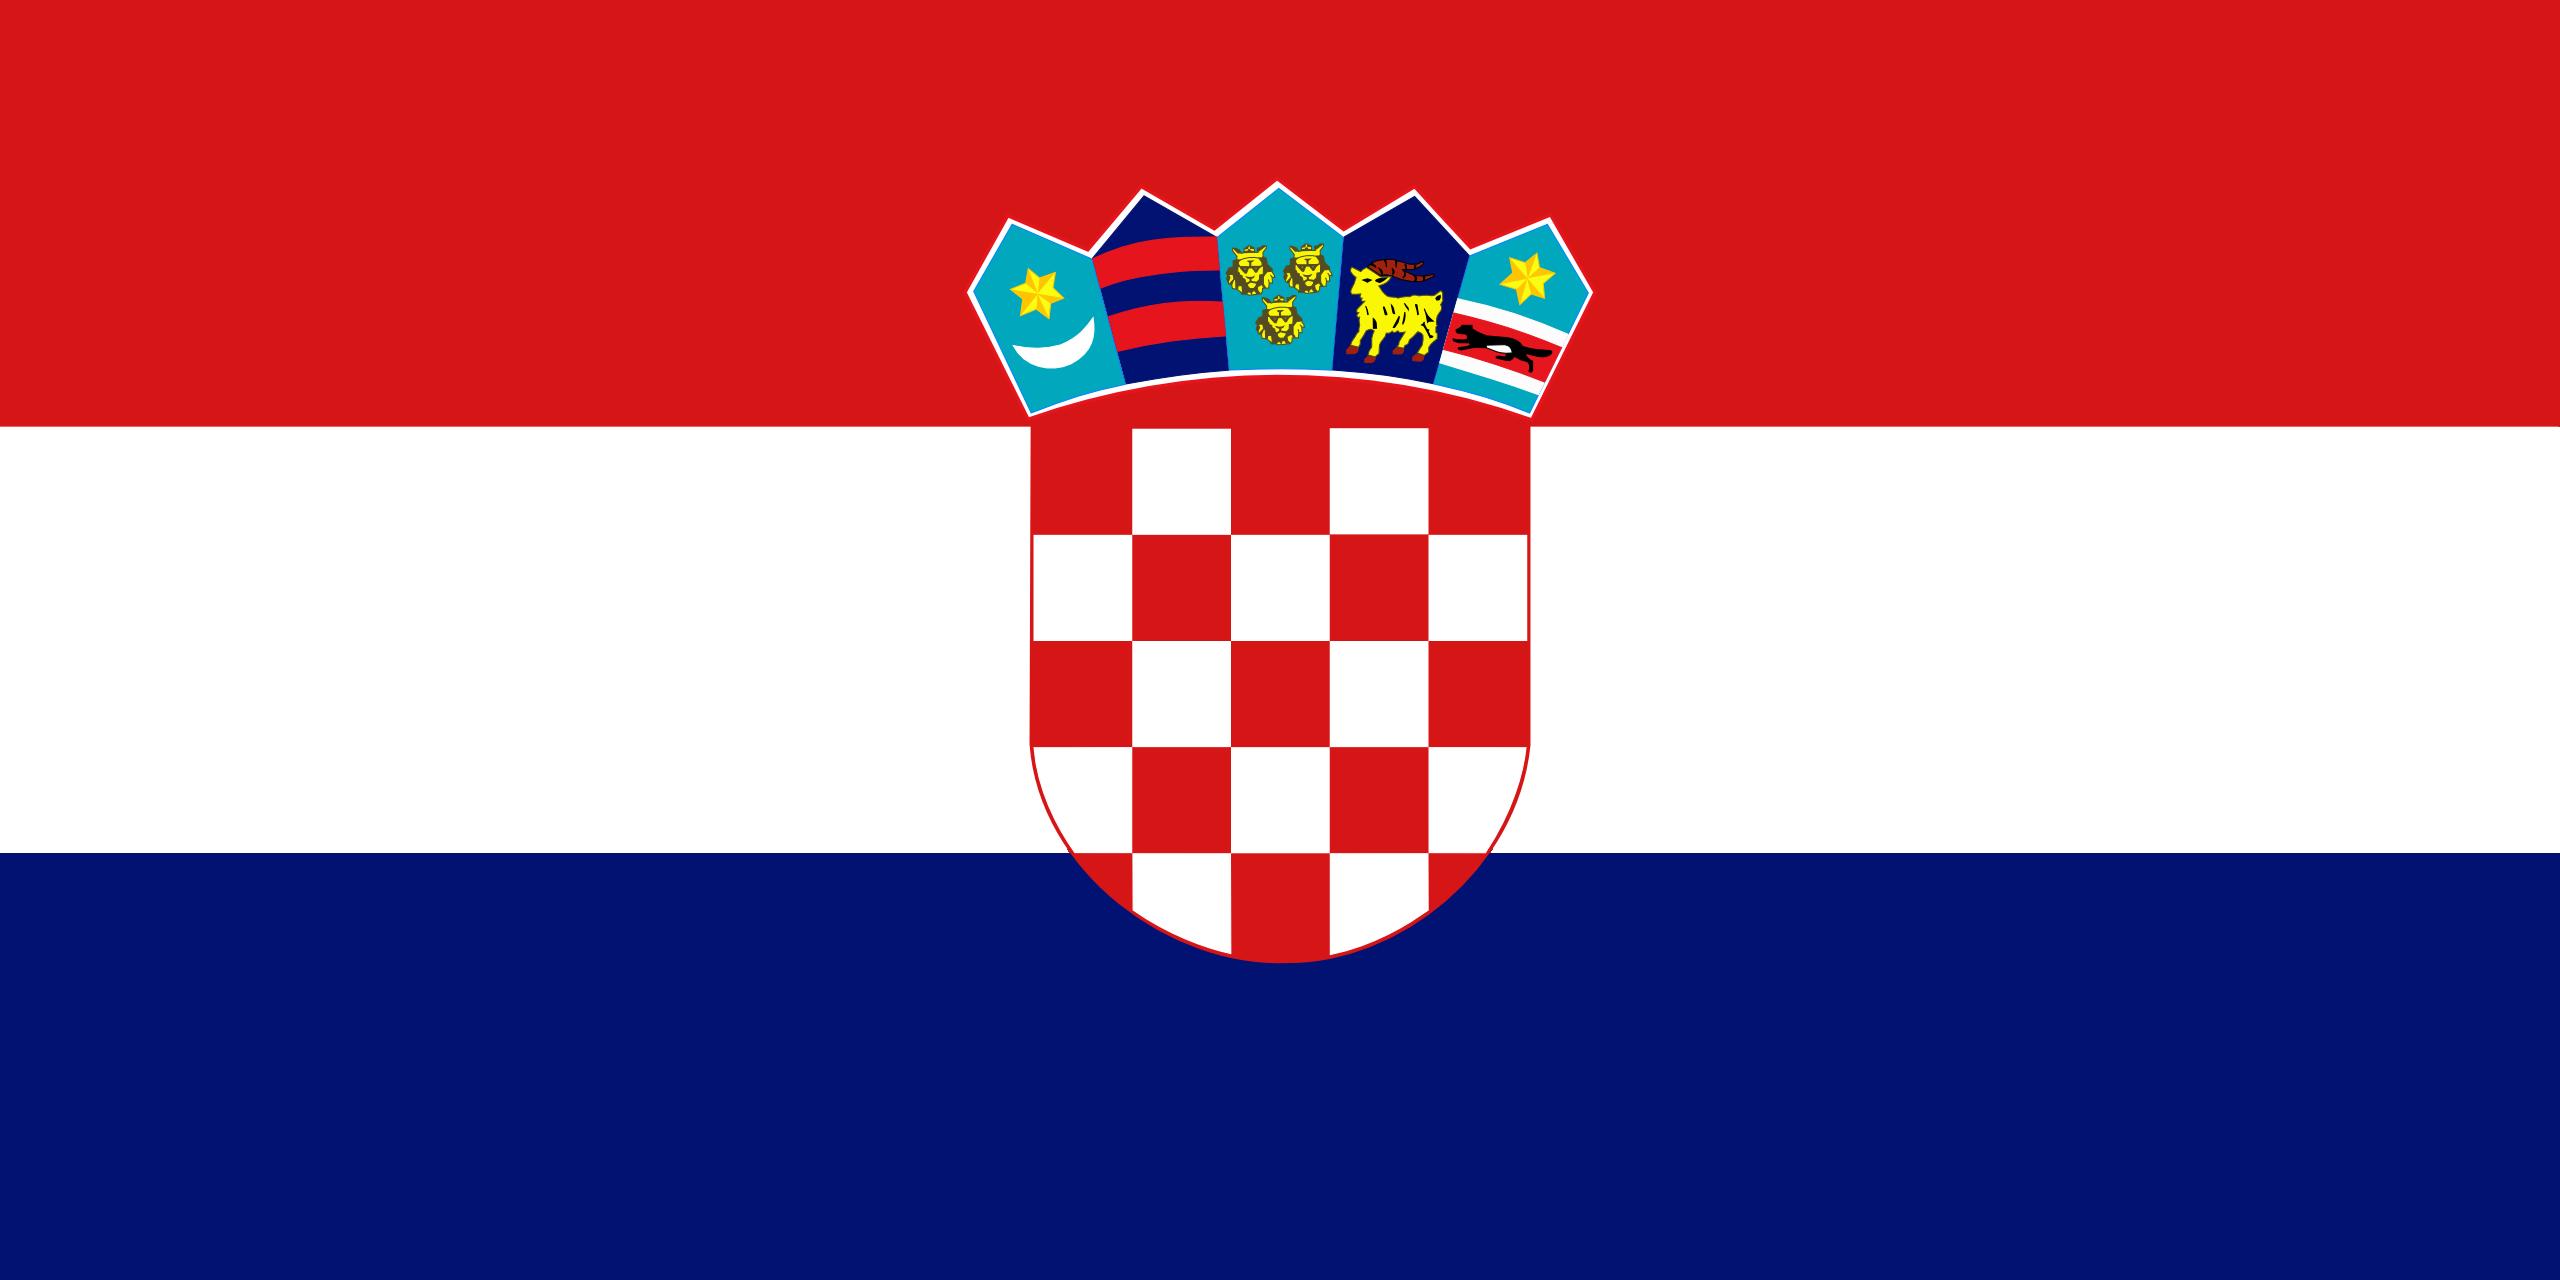 croacia, 国家, 会徽, 徽标, 符号 - 高清壁纸 - 教授-falken.com